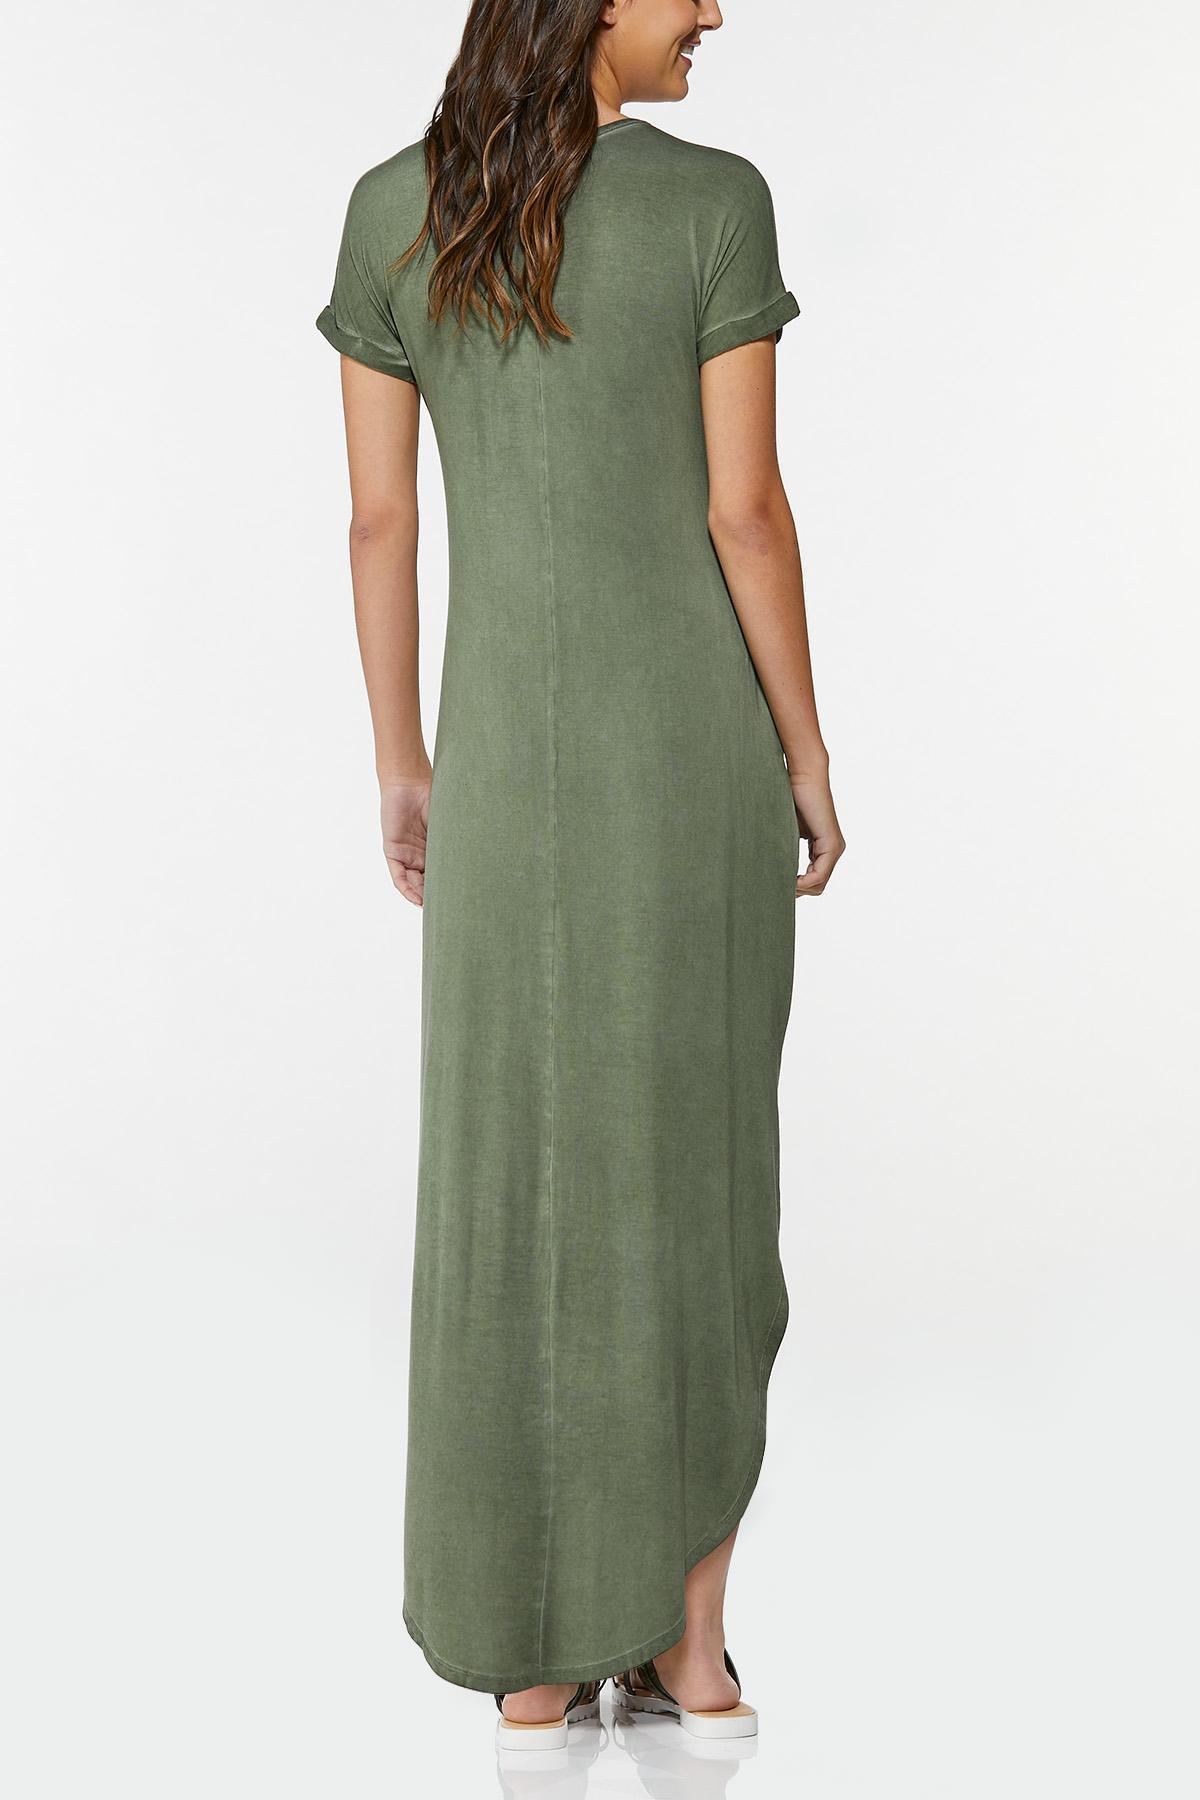 Plus Size Rise Above Maxi Shirt Dress (Item #44695370)